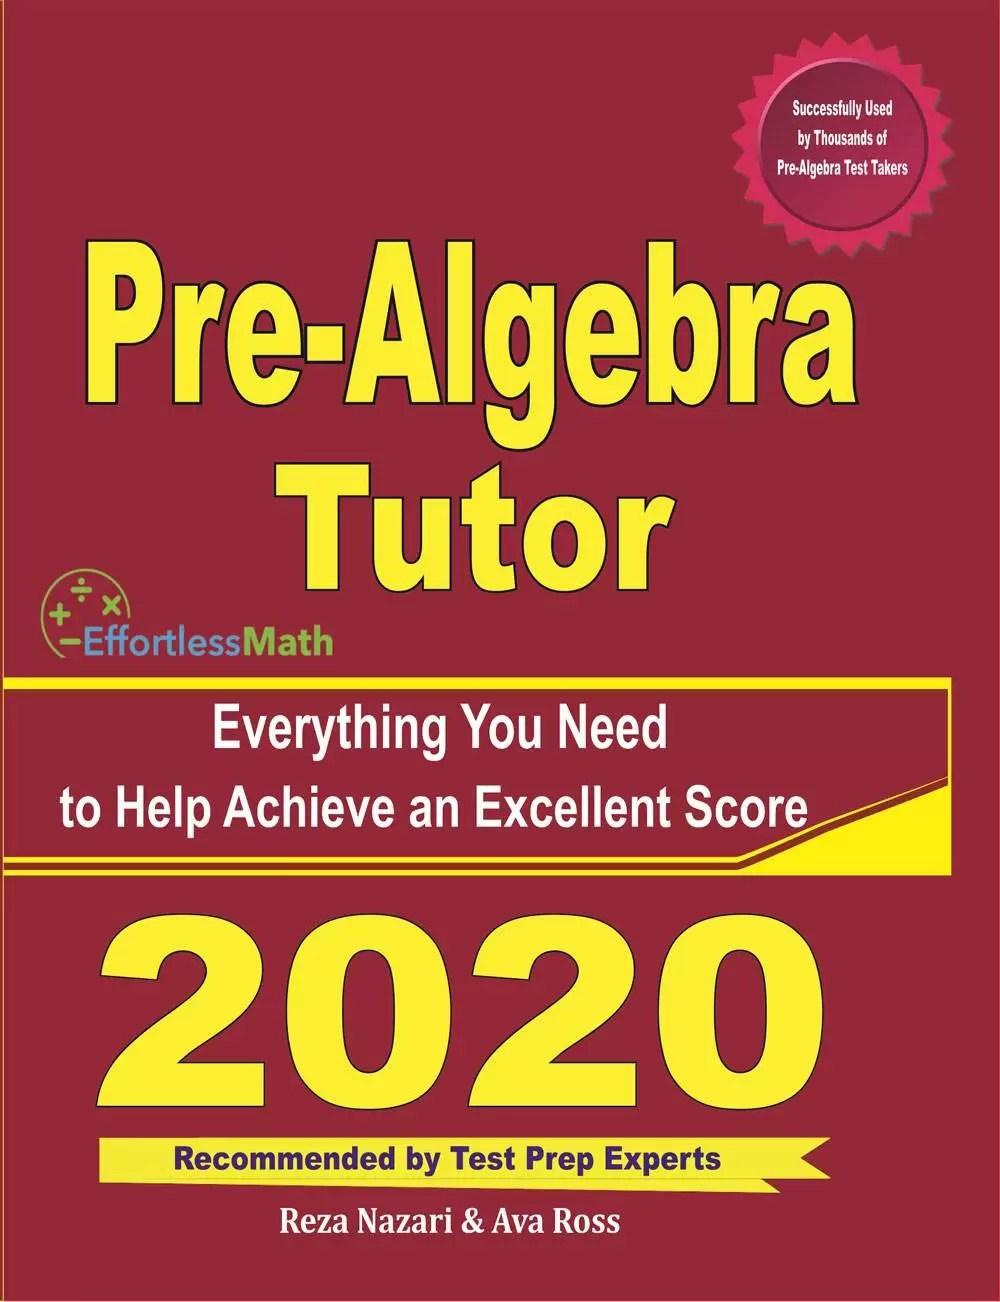 medium resolution of Pre-Algebra Worksheets - Effortless Math